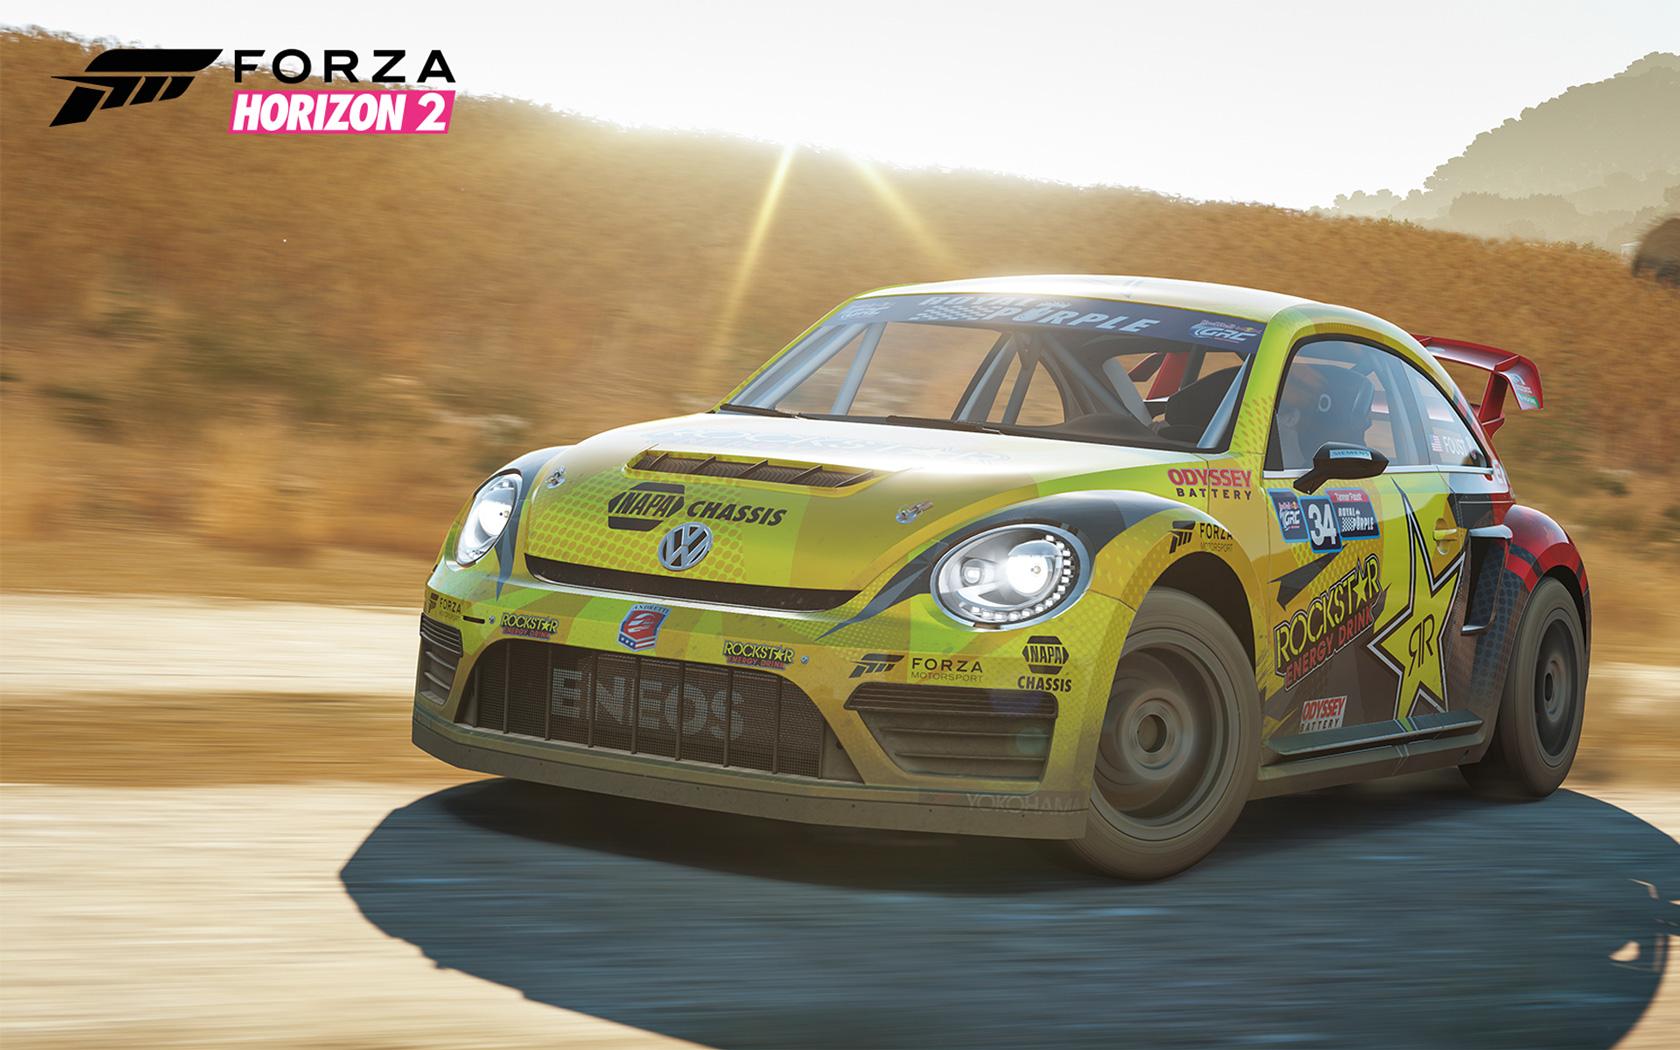 Forza Horizon 2 Wallpaper in 1680x1050